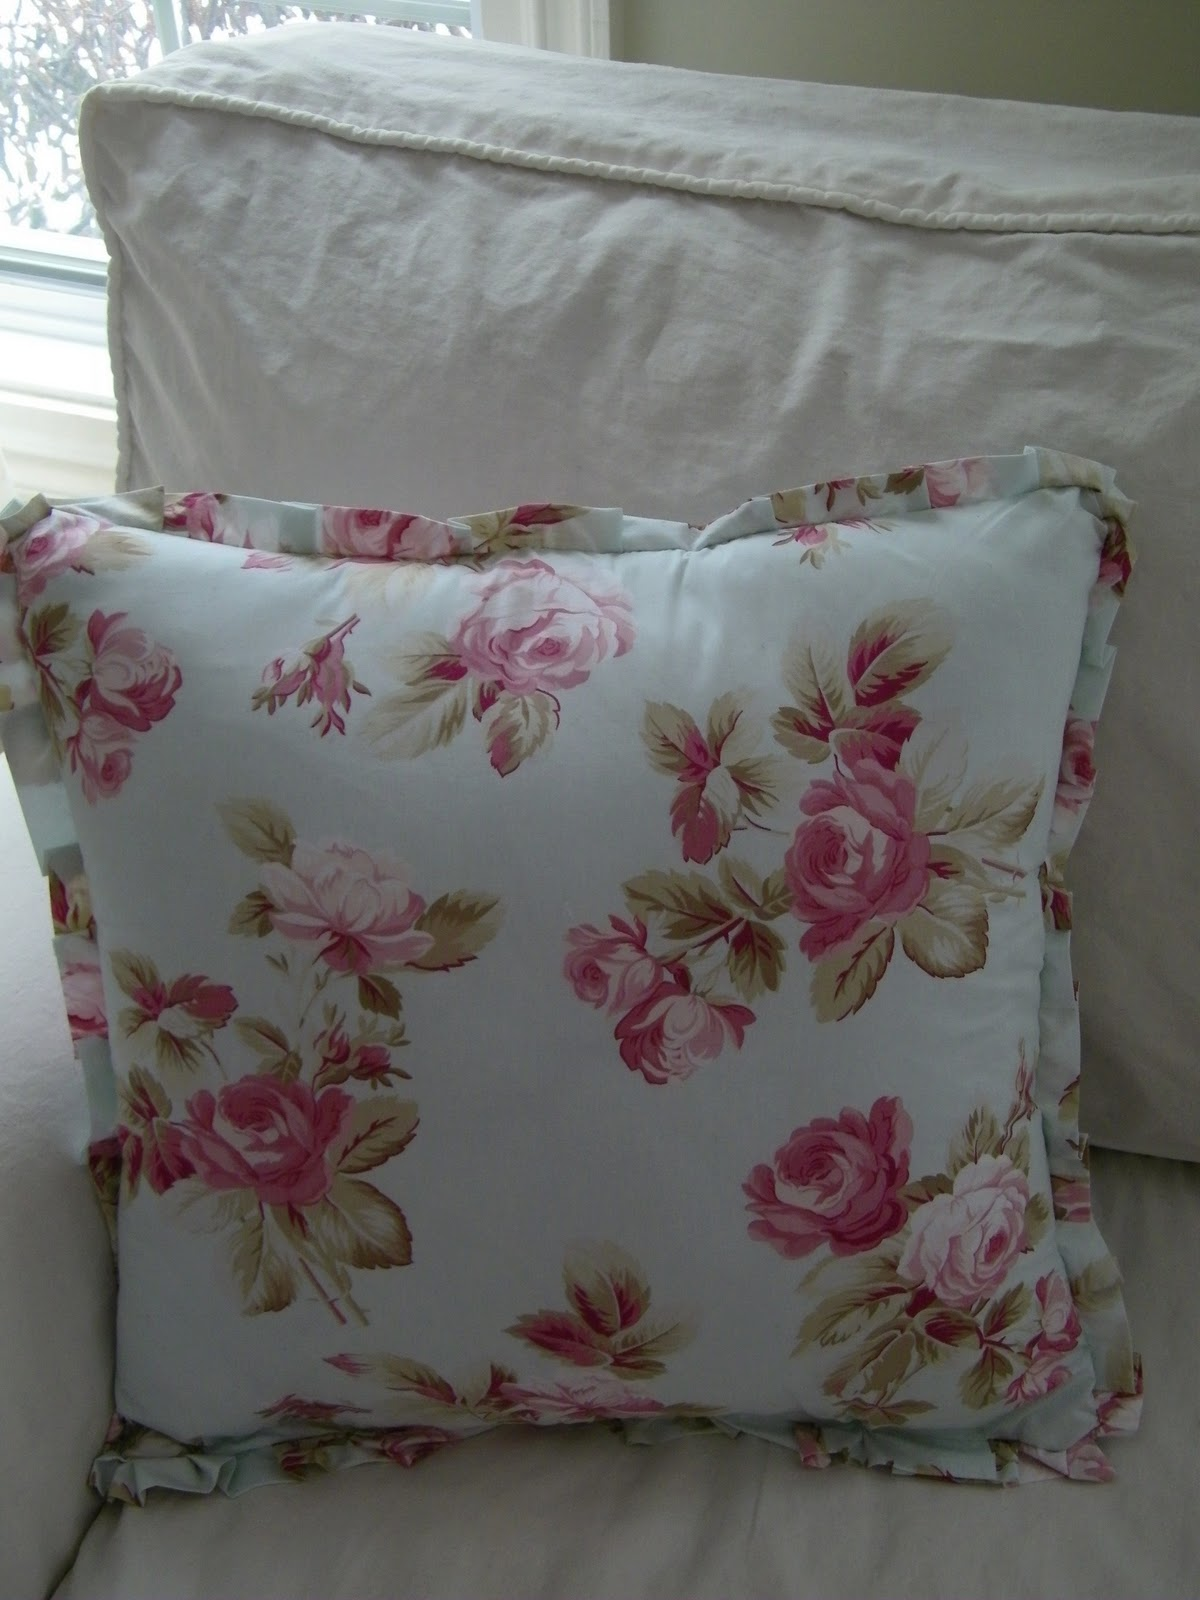 Maison Decor: Authentic Shabby Chic Pillows